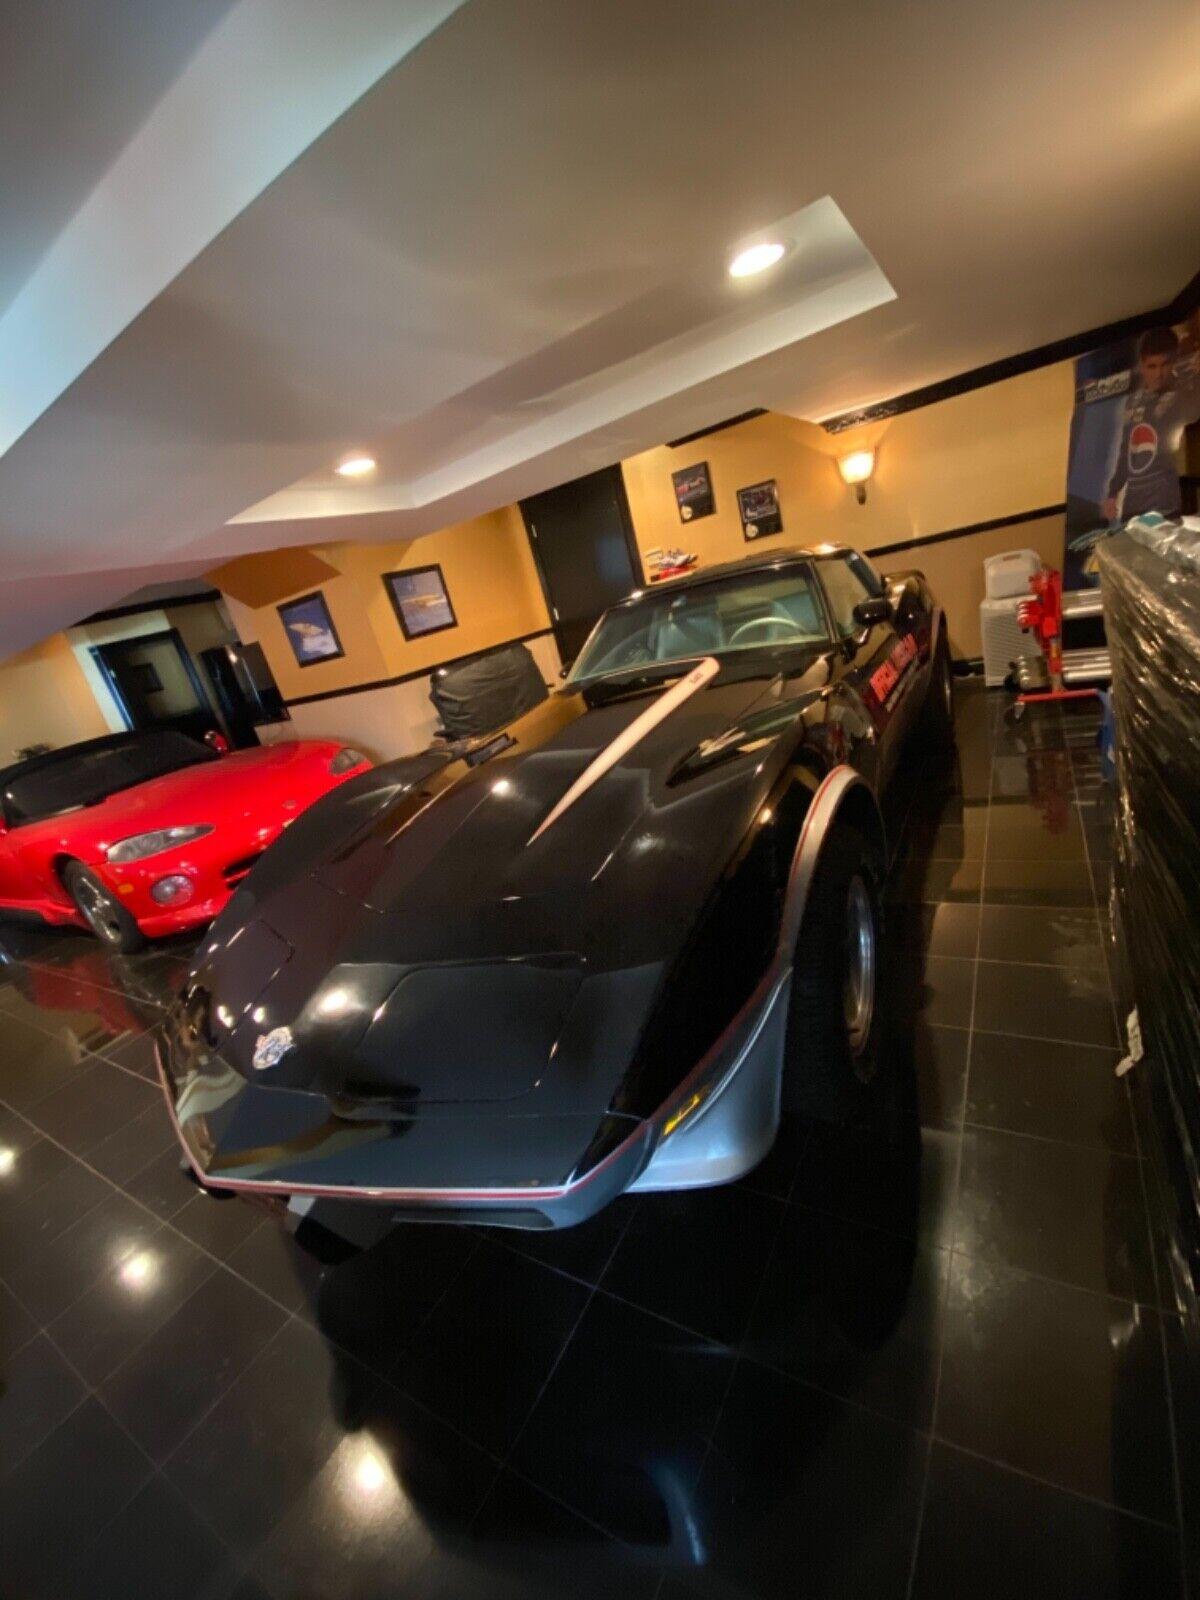 1978 Black Chevrolet Corvette   | C3 Corvette Photo 4